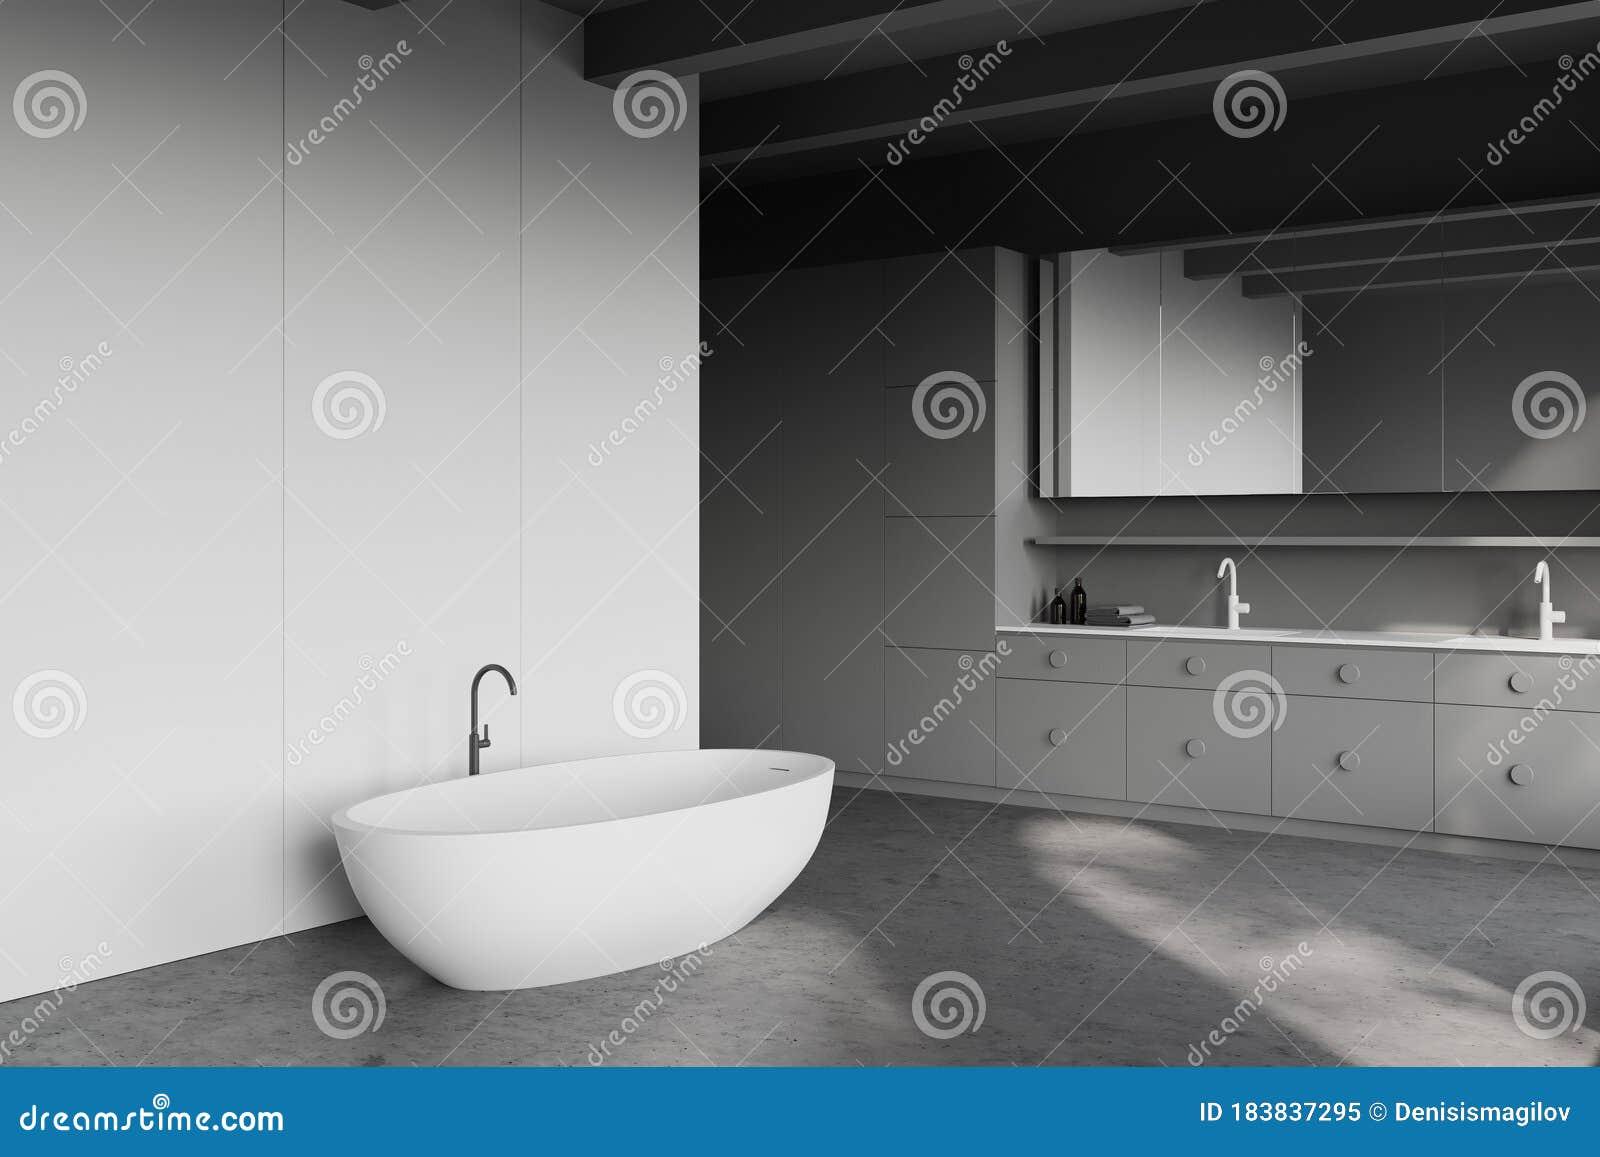 White And Grey Bathroom Corner Tub And Sink Stock Illustration Illustration Of Decor Master 183837295